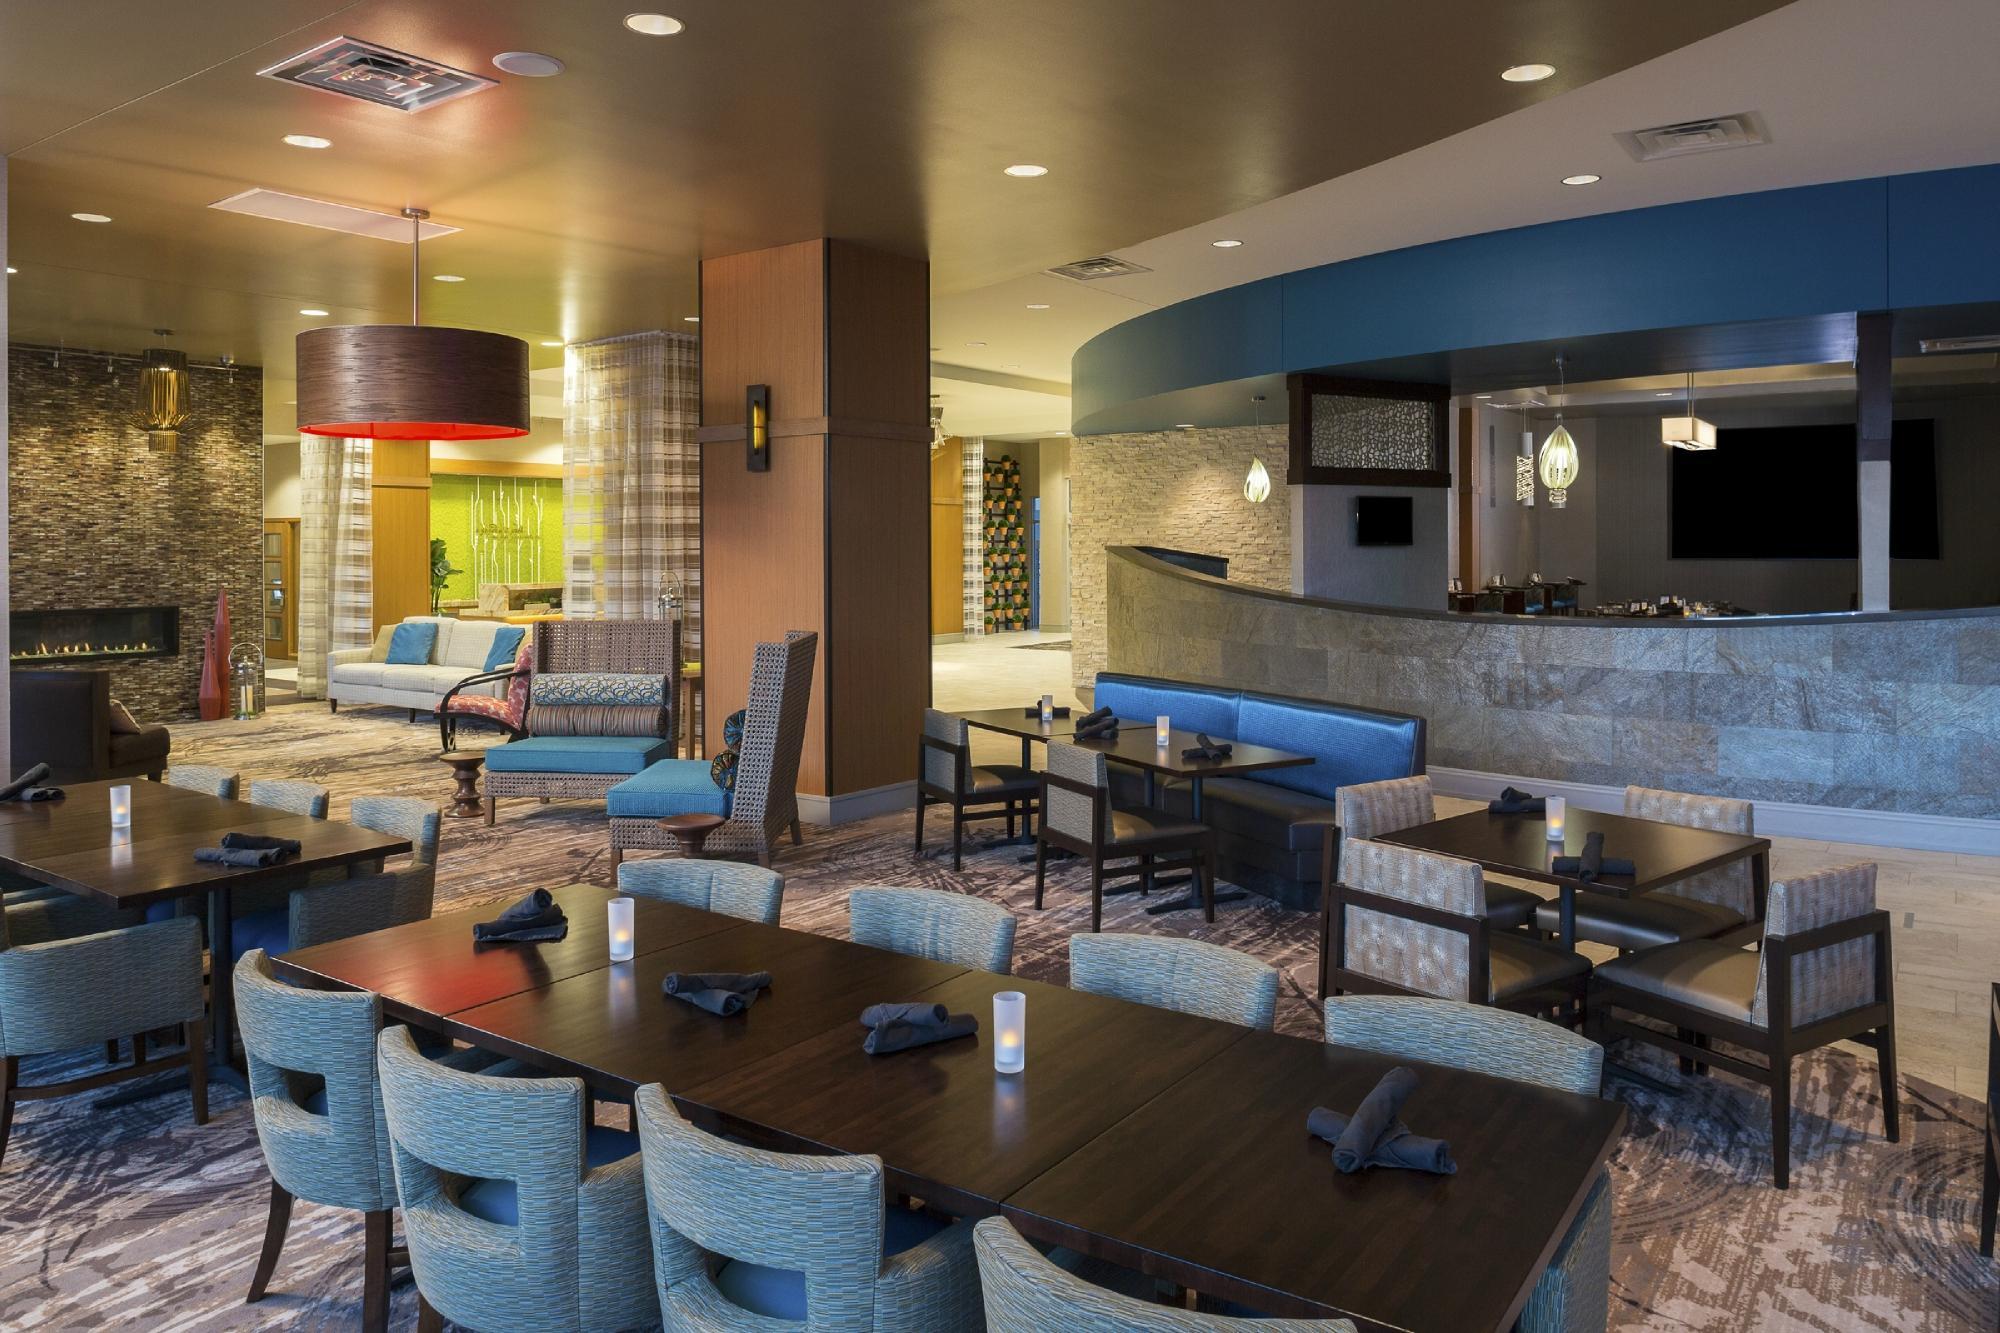 Hilton Garden Inn Downtown Sioux Falls Sd 2017 Hotel